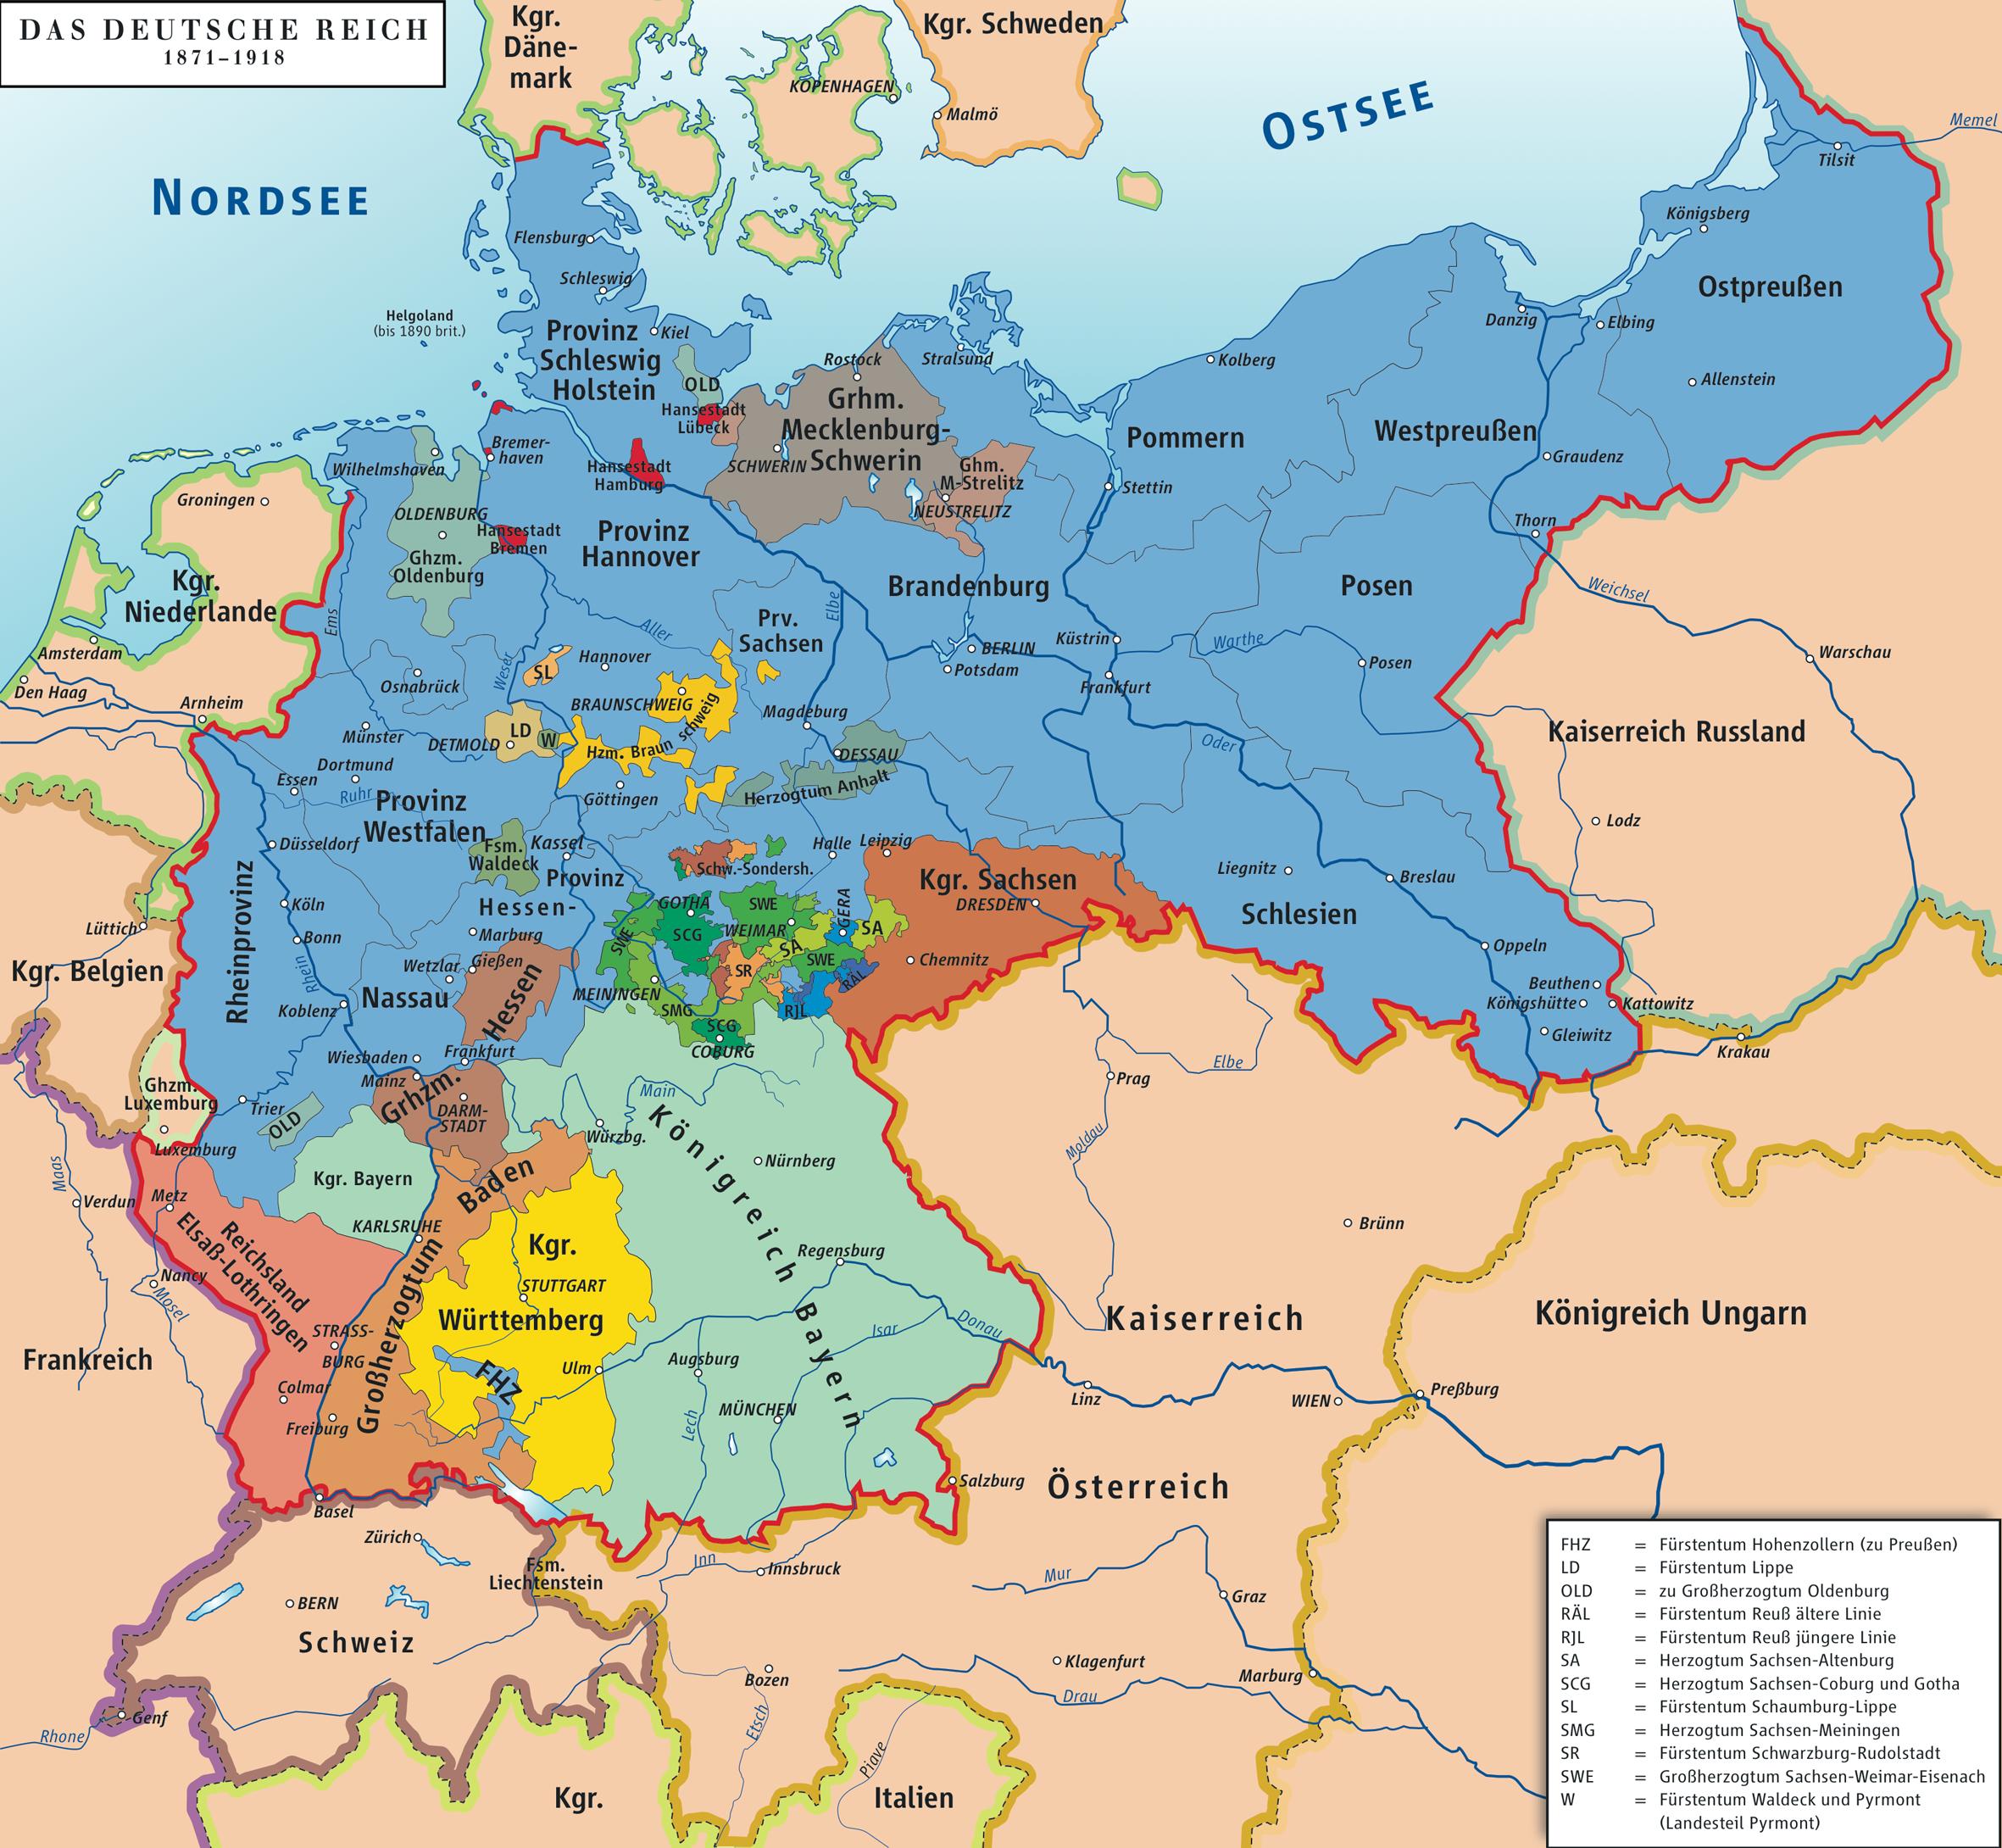 1848 Frankfurt Congress